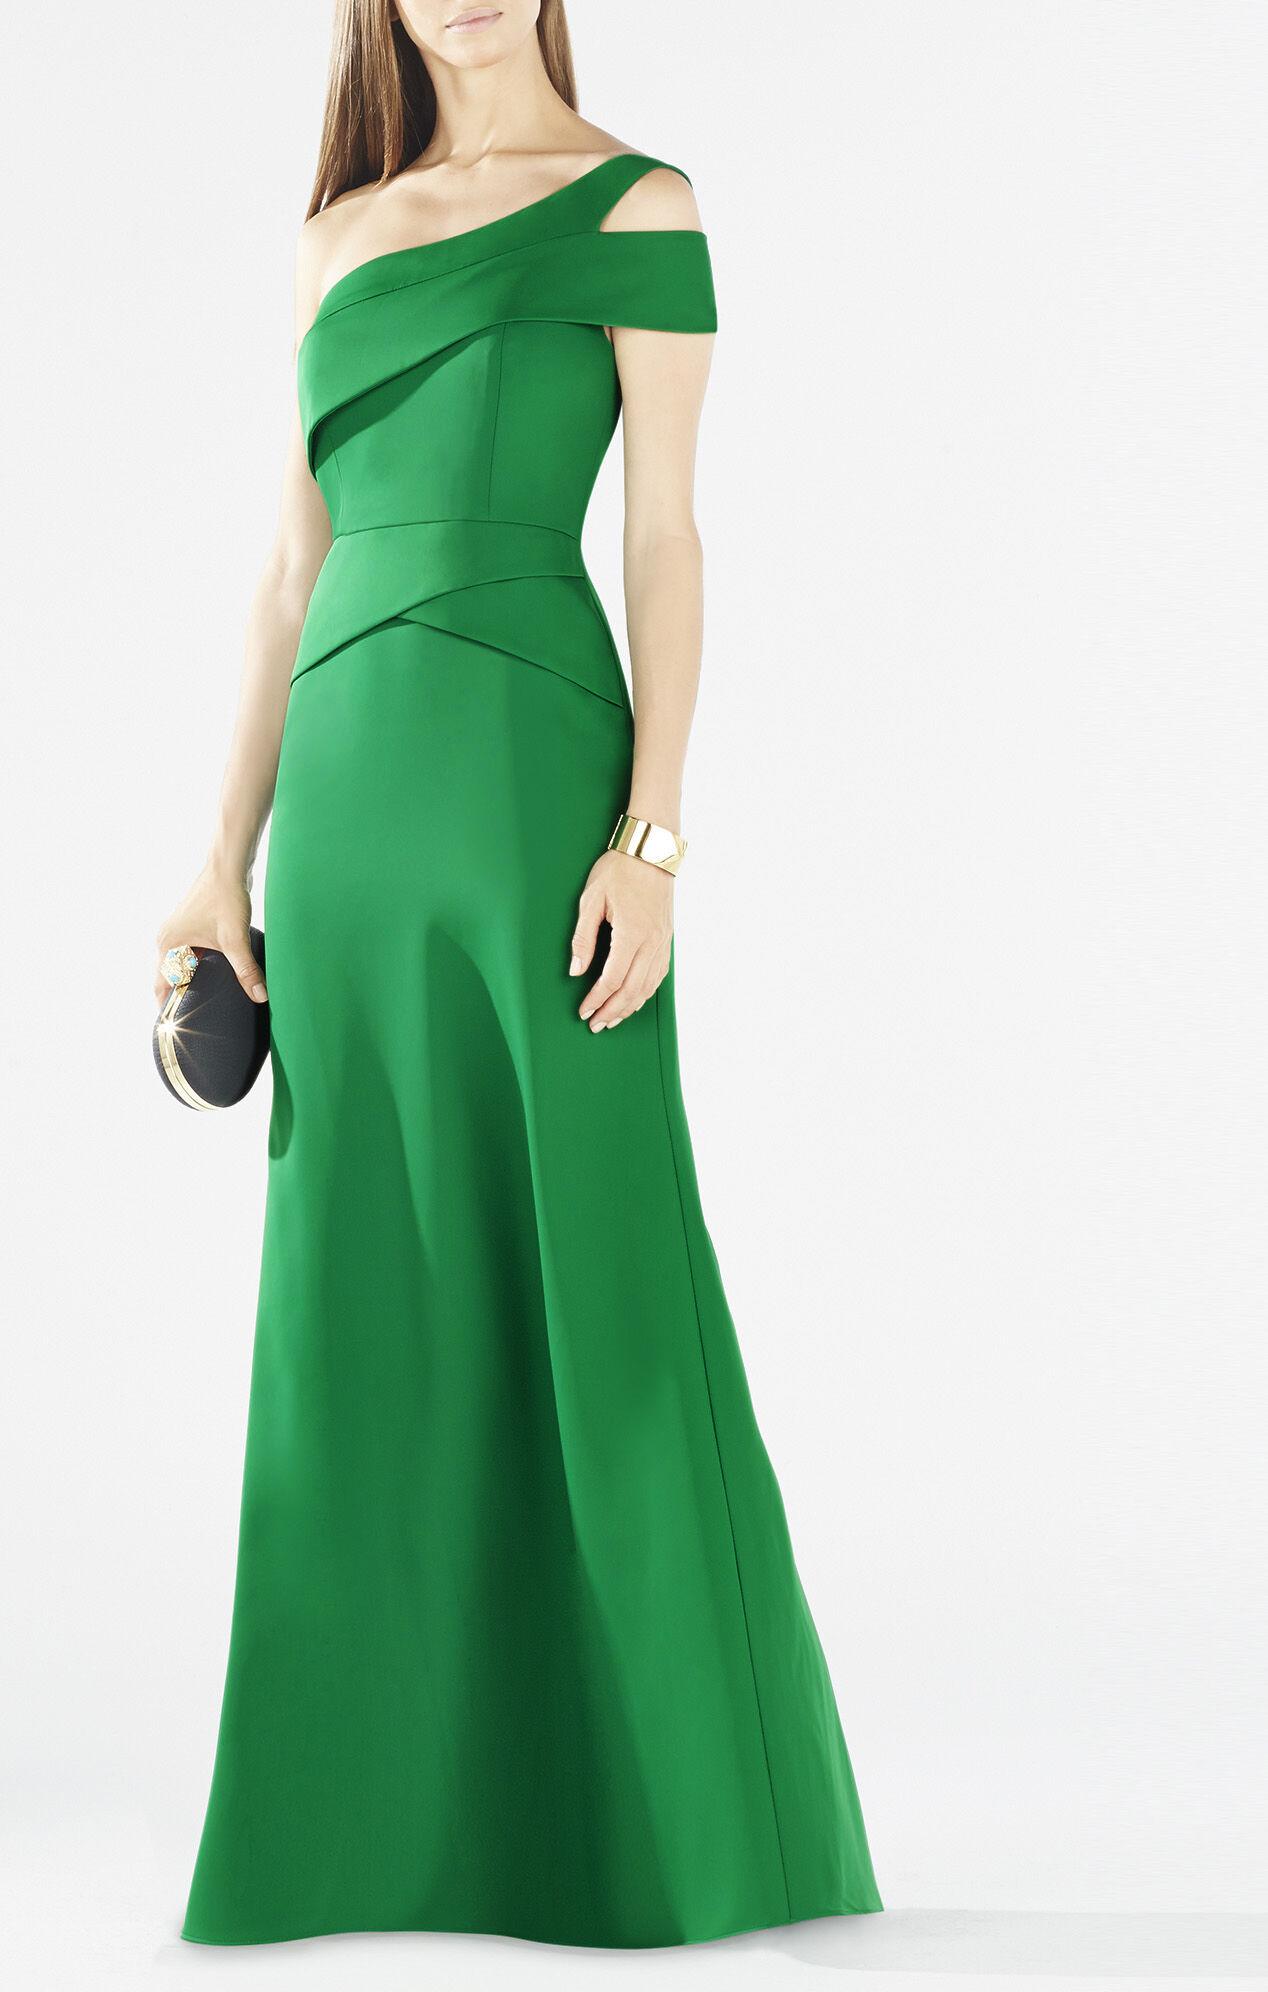 BCBG One Shoulder Peplum Dress